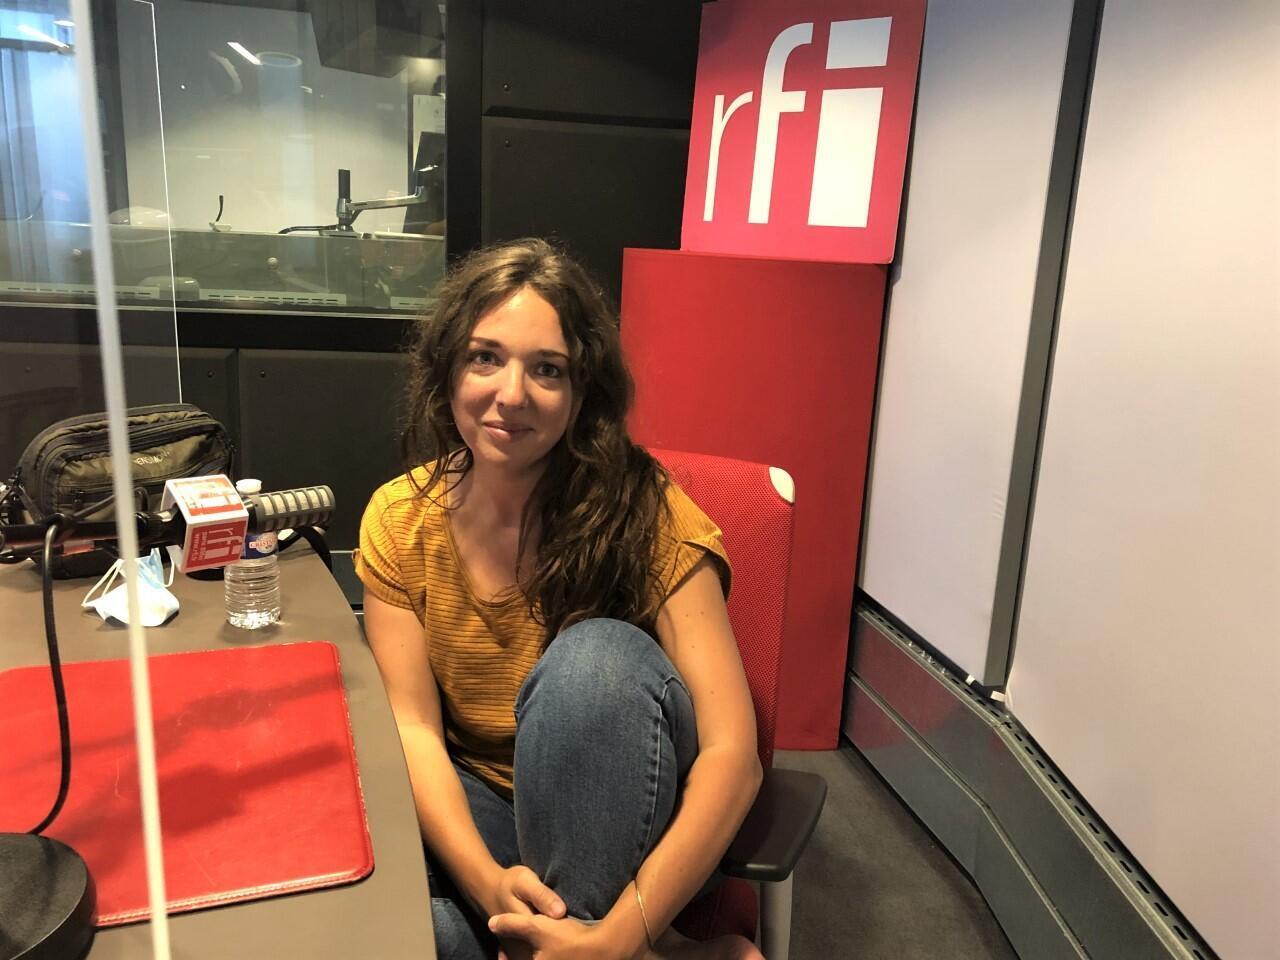 Emilienne_Malfatto_CFT_RFI (2)